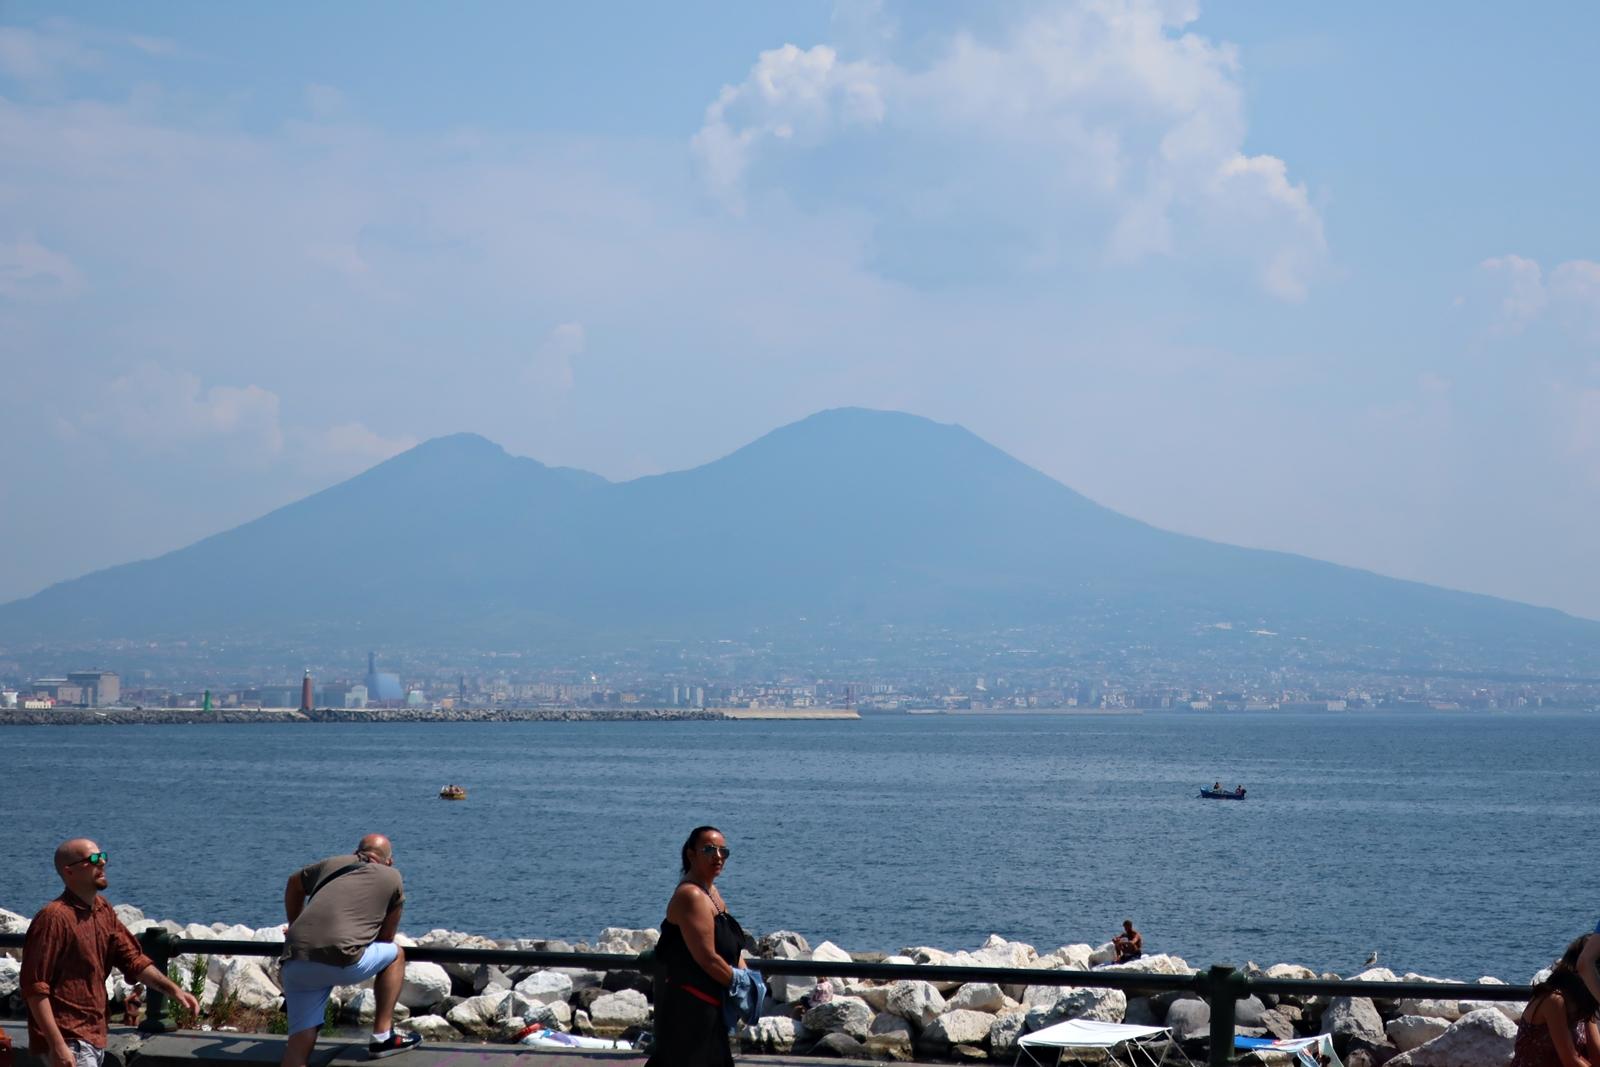 IMG_1838(Napoli_Vesvio).jpg